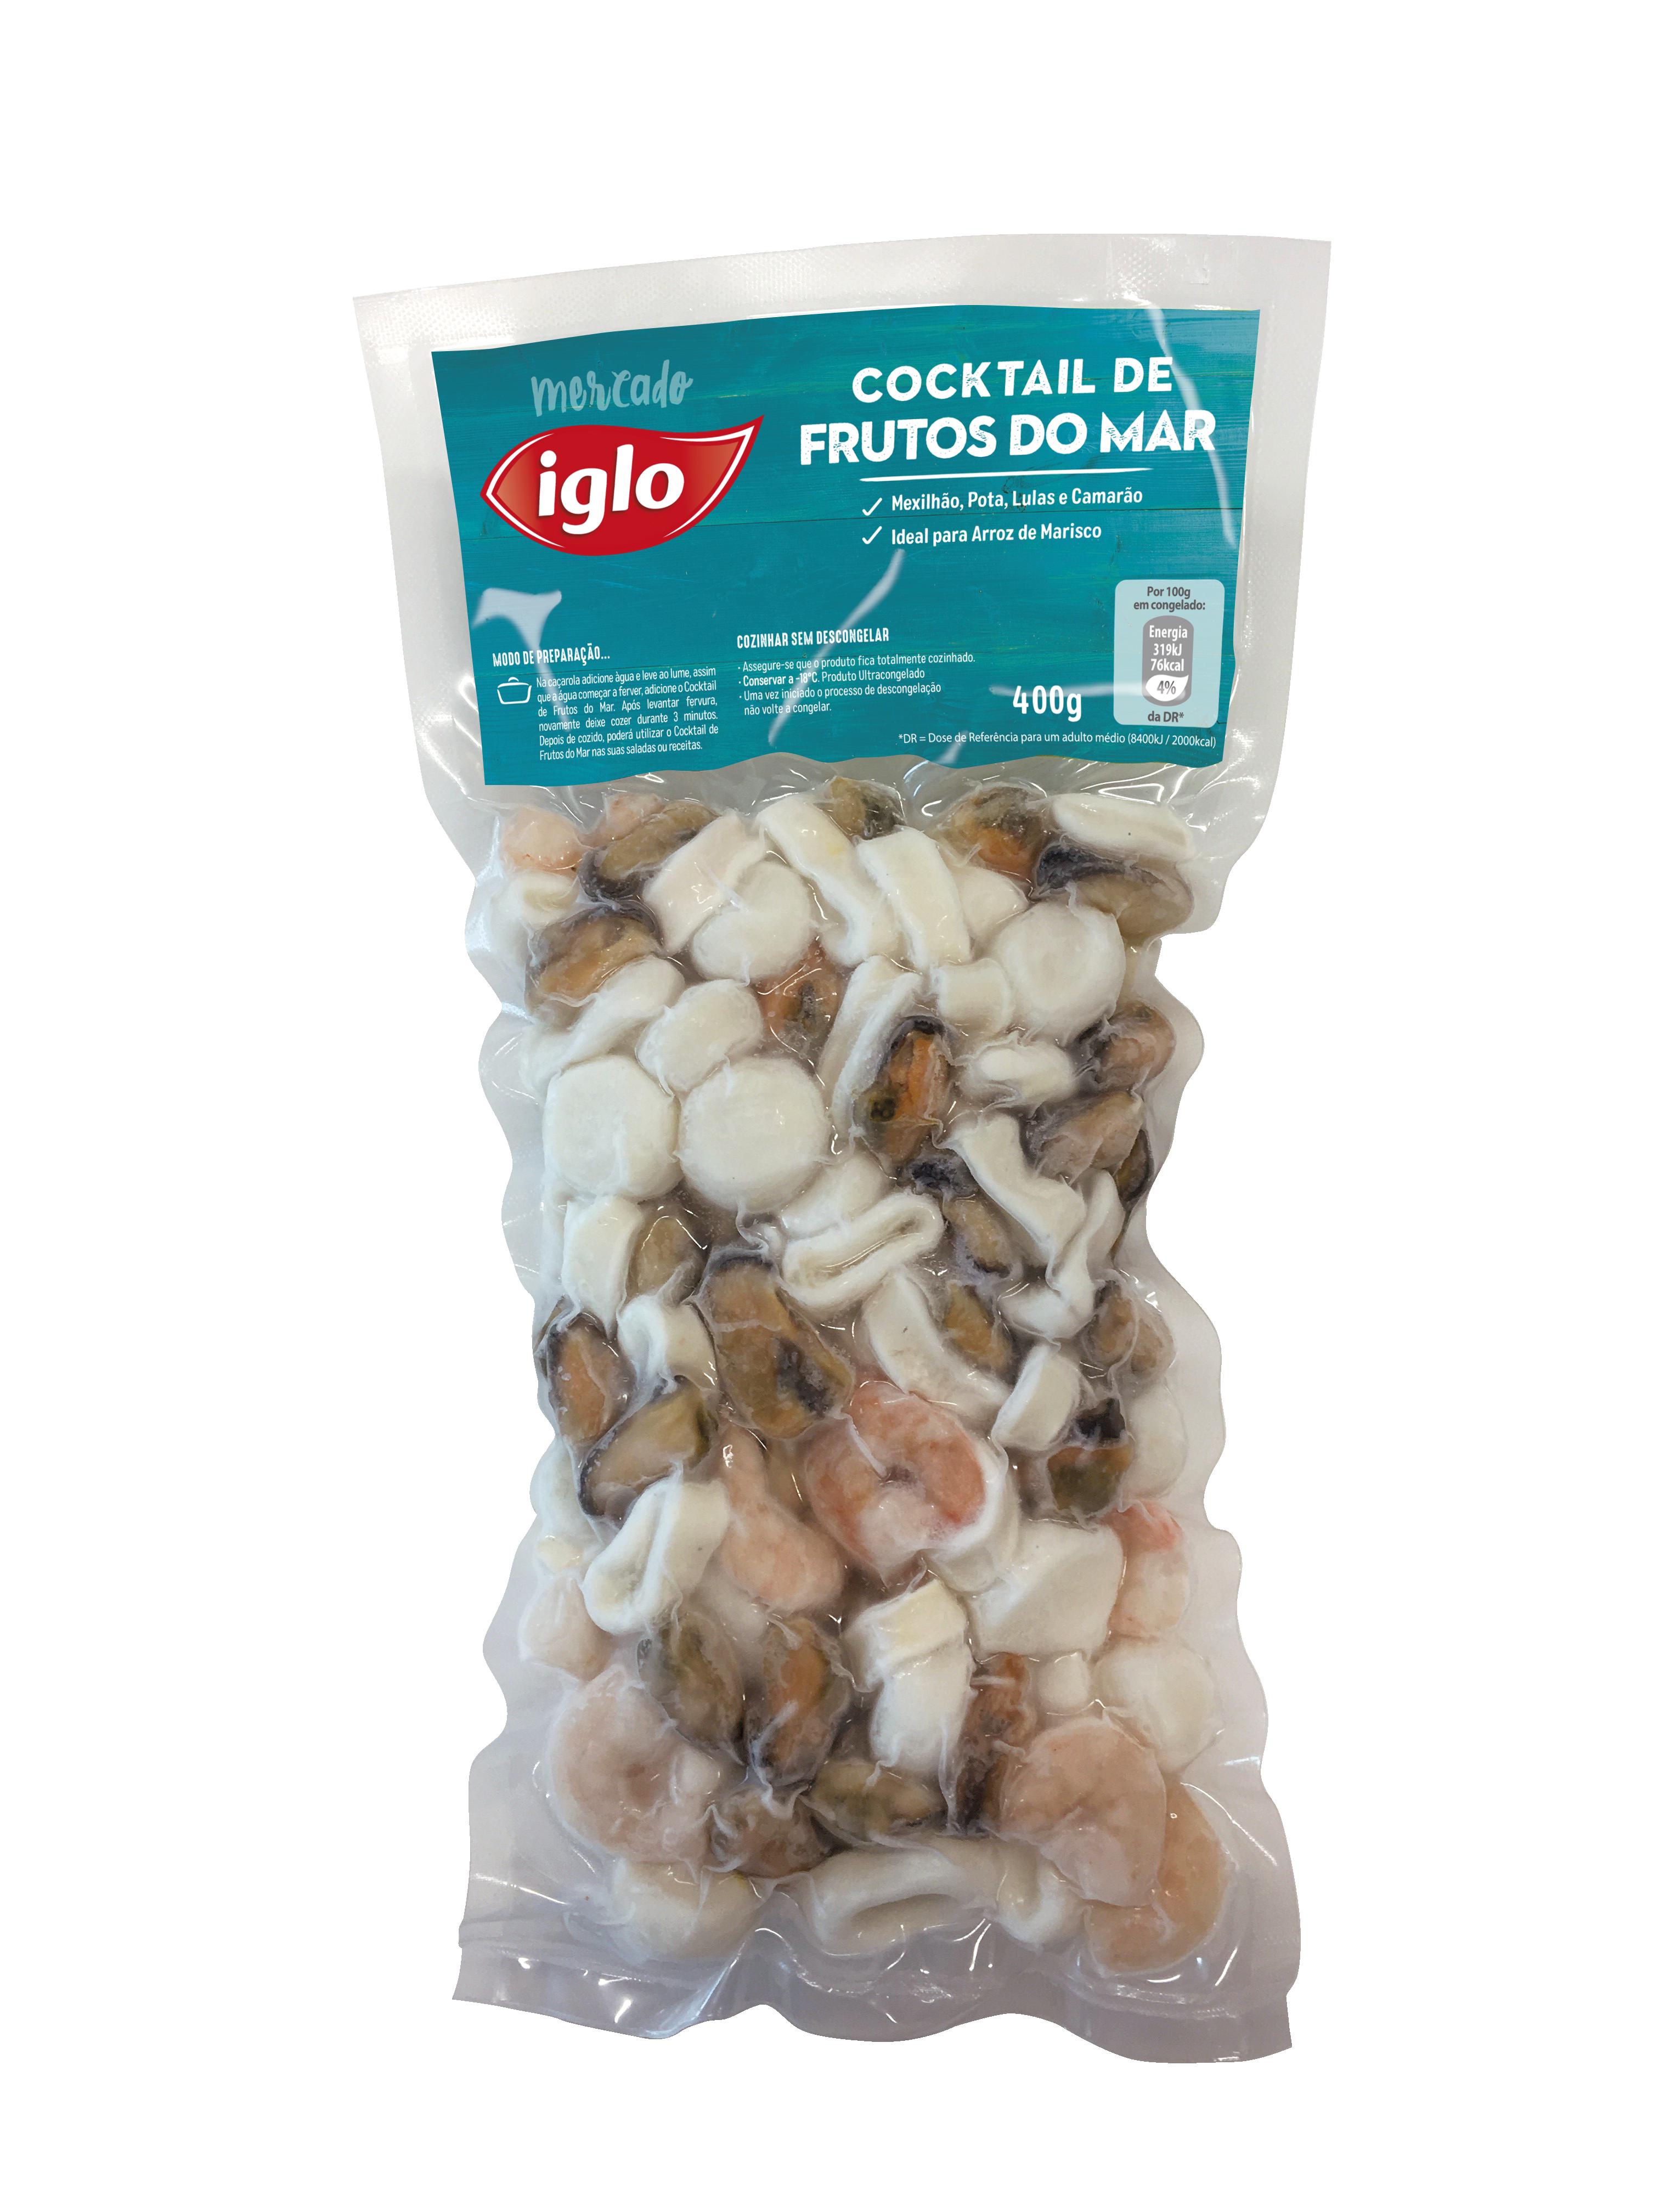 cocktail de frutos do mar